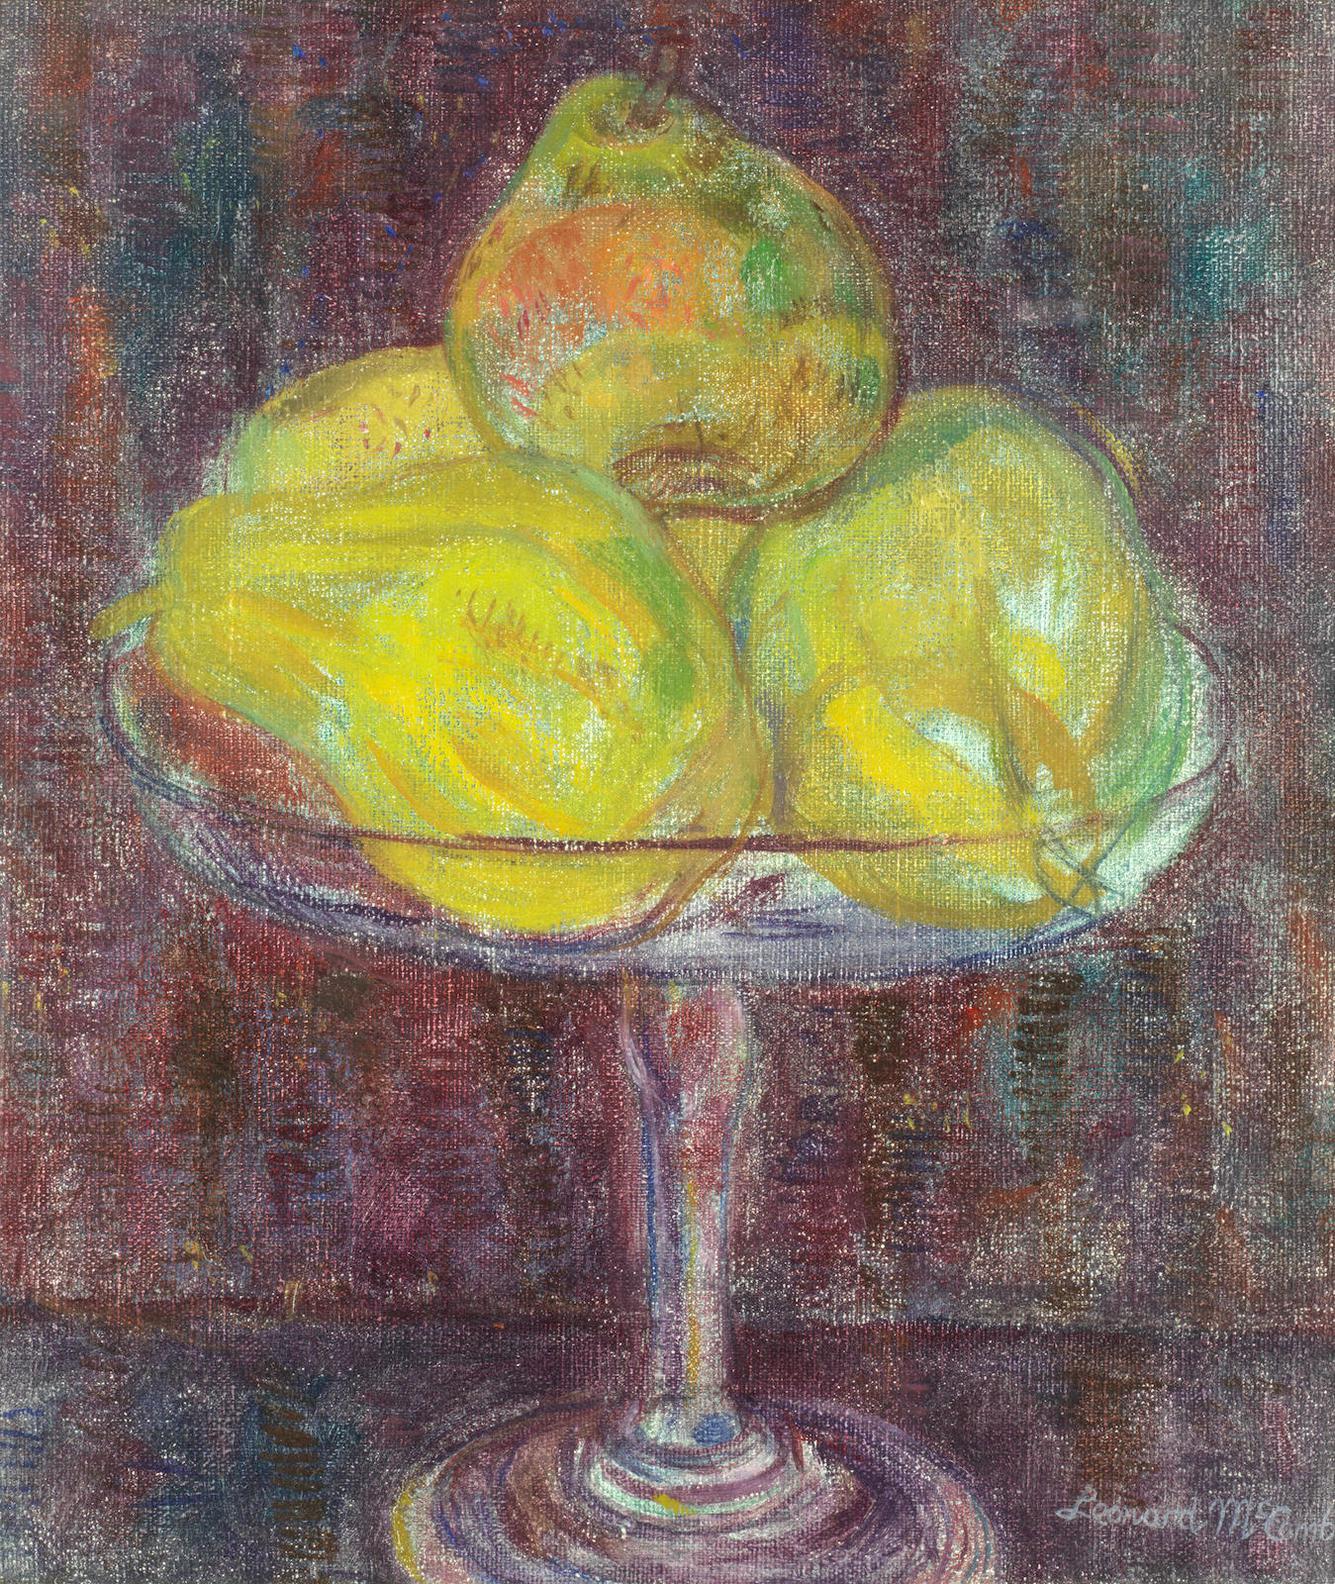 Leonard Mccomb - Stil Life, Pears-